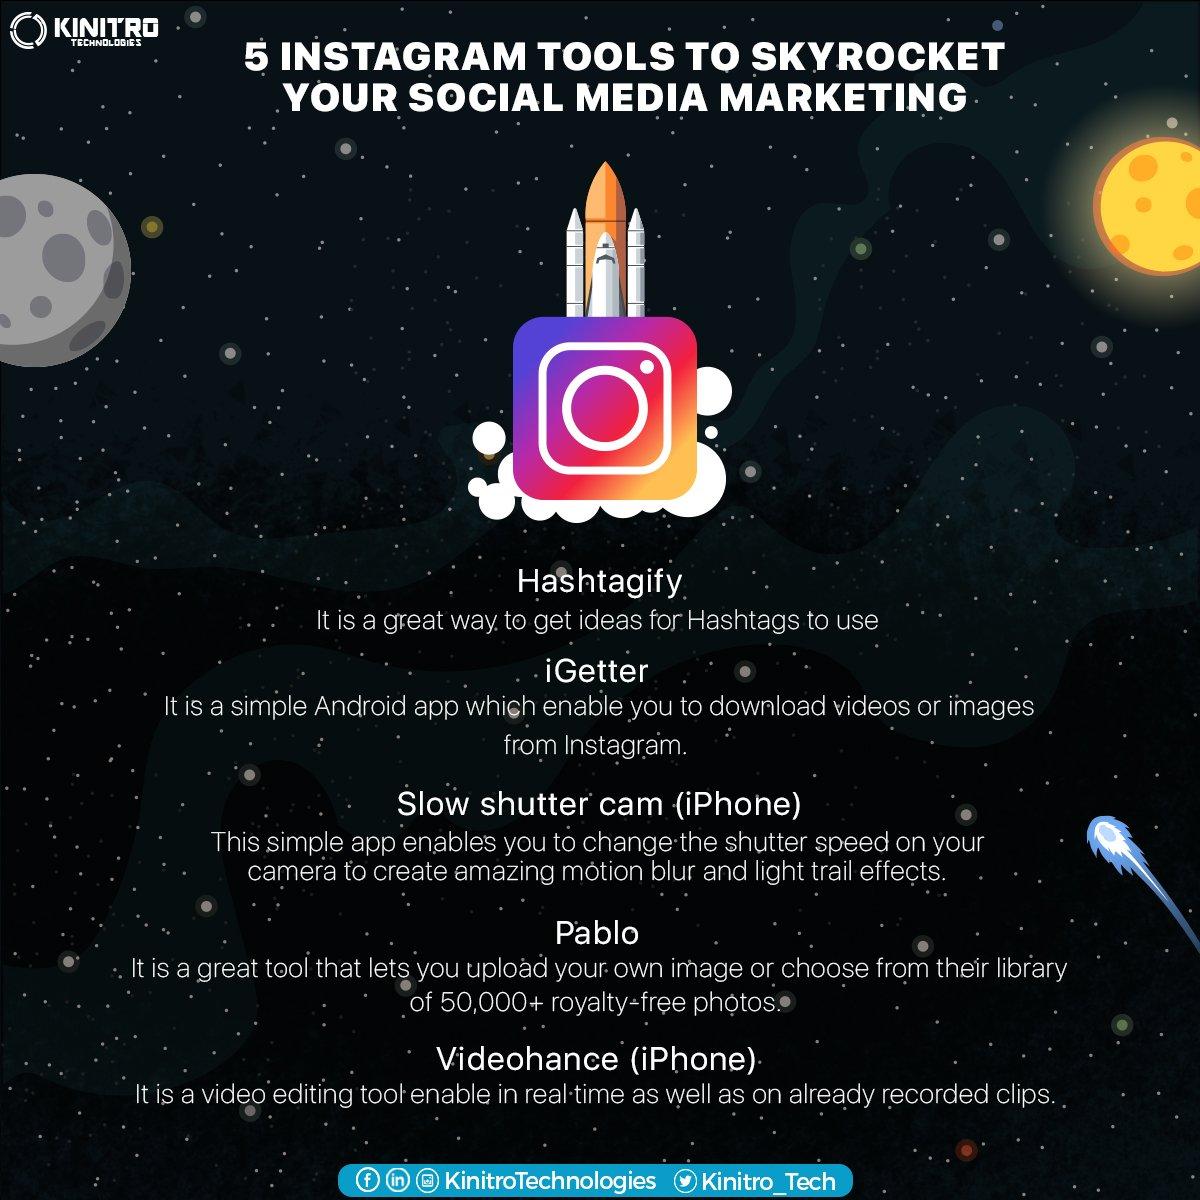 5 Instagram tools to skyrocket your #socialmedia marketing! #Socialmediamarketing #DigitalMarketing https://t.co/1G4IP9EFDW